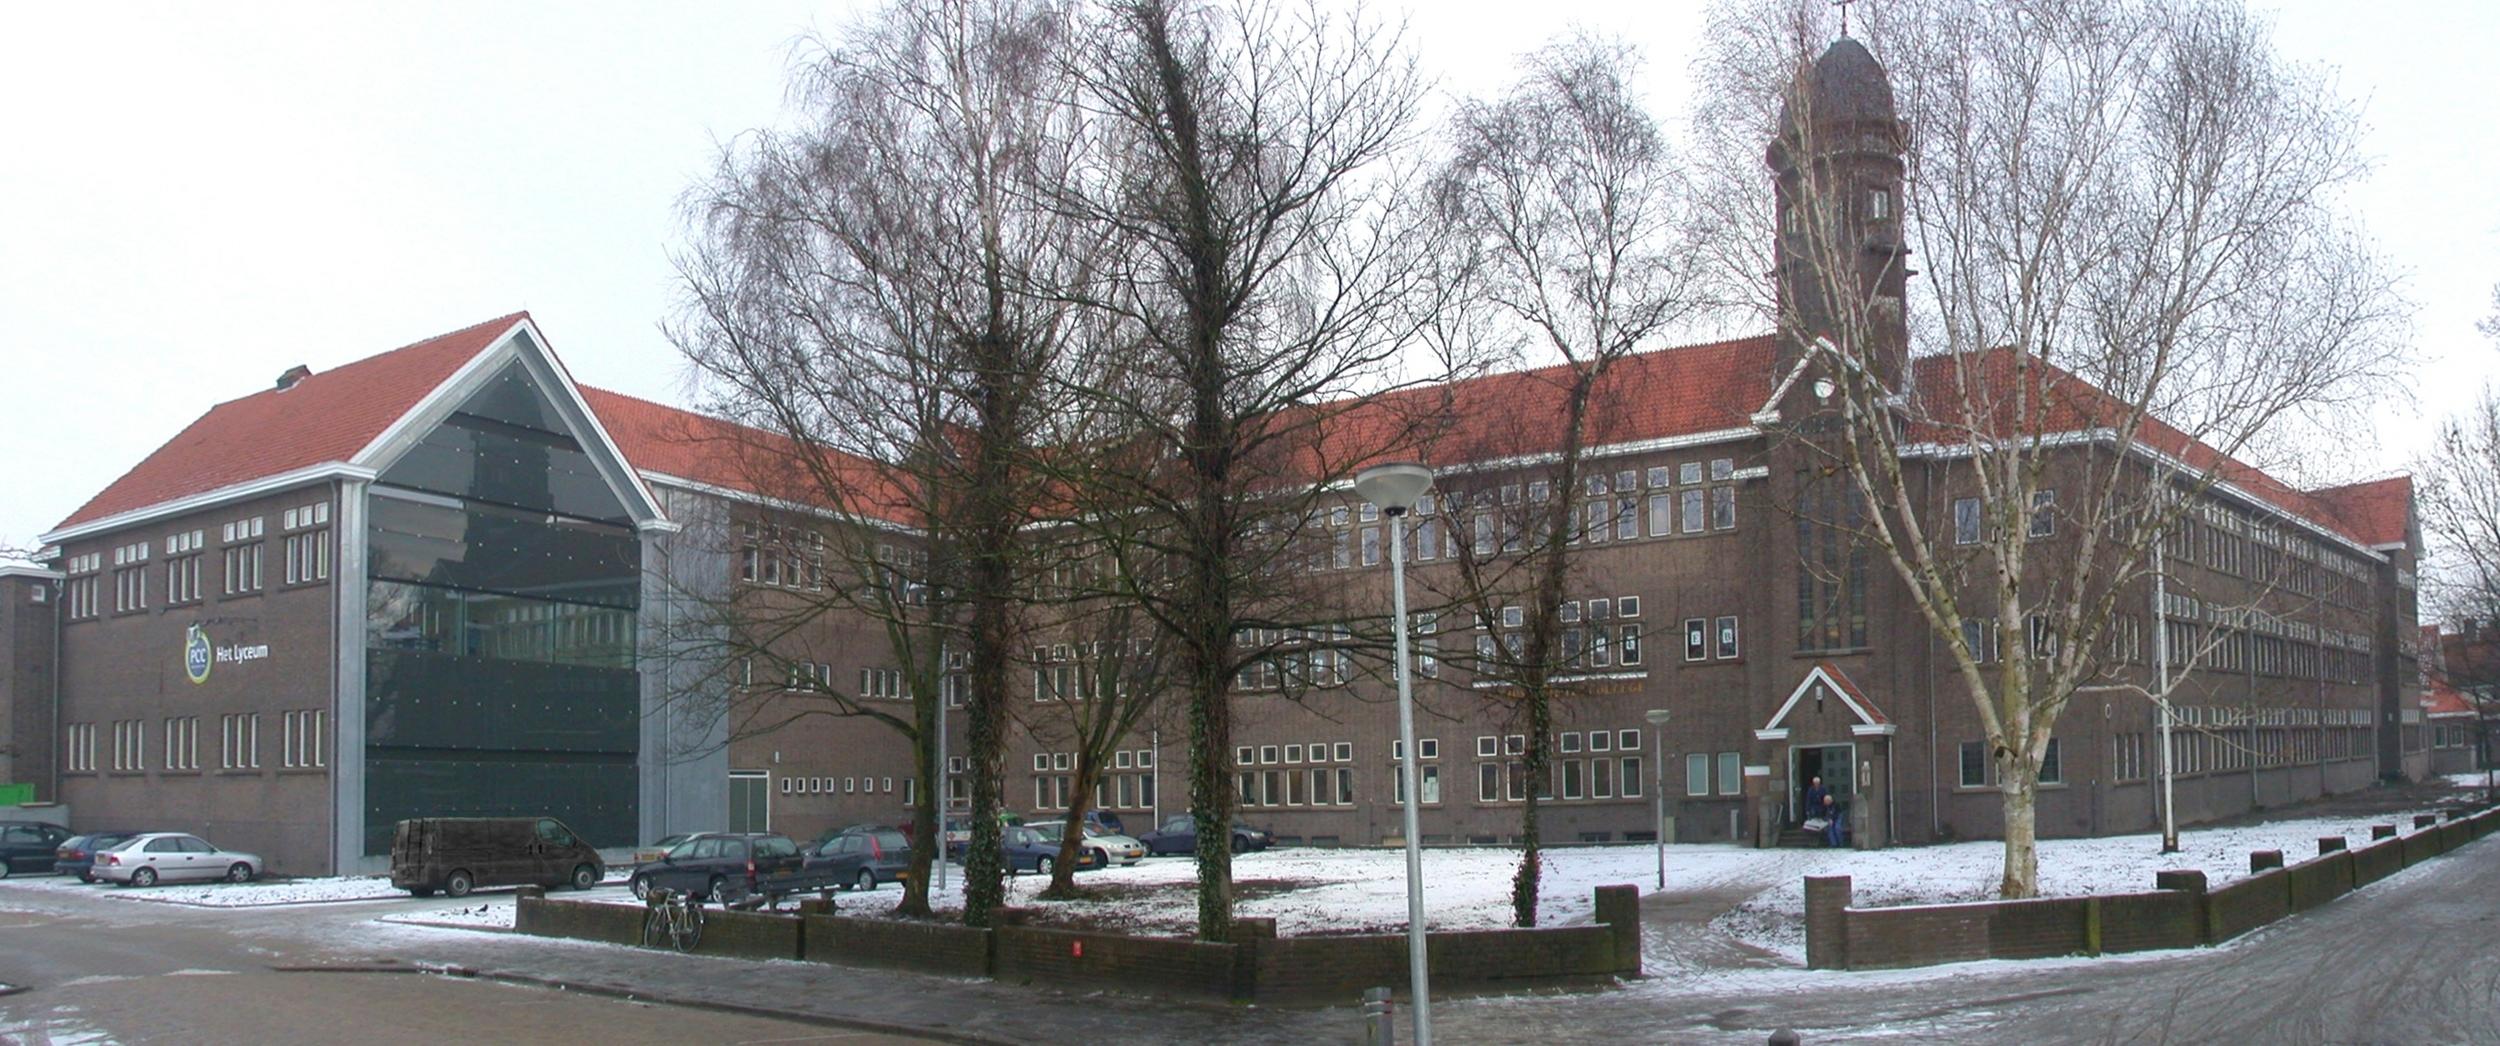 Petrus Canisius College, Het Lyceum - Alkmaar